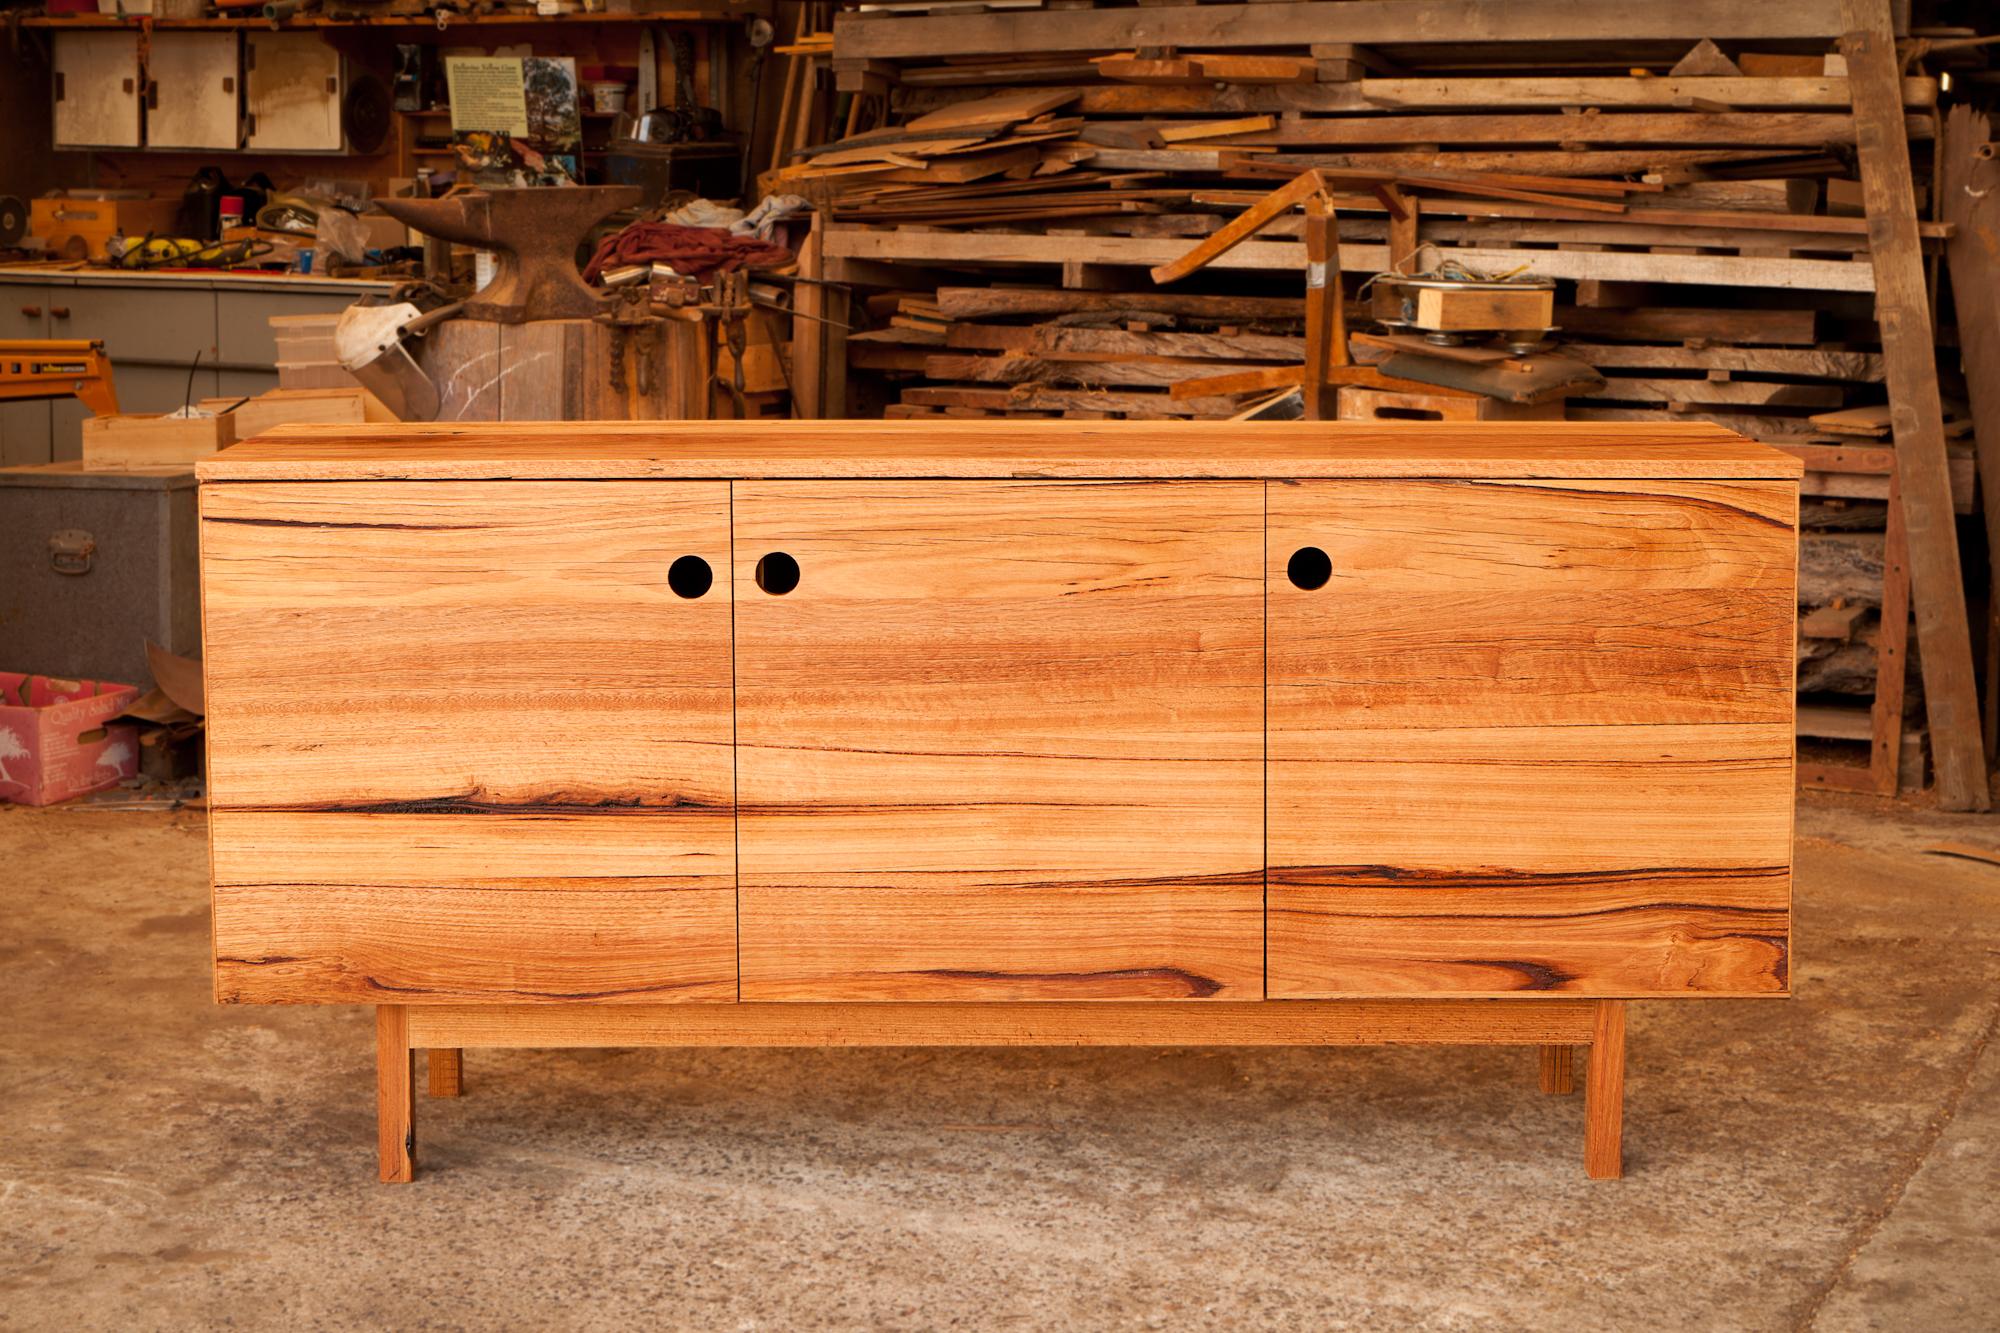 Medium timber tone variation